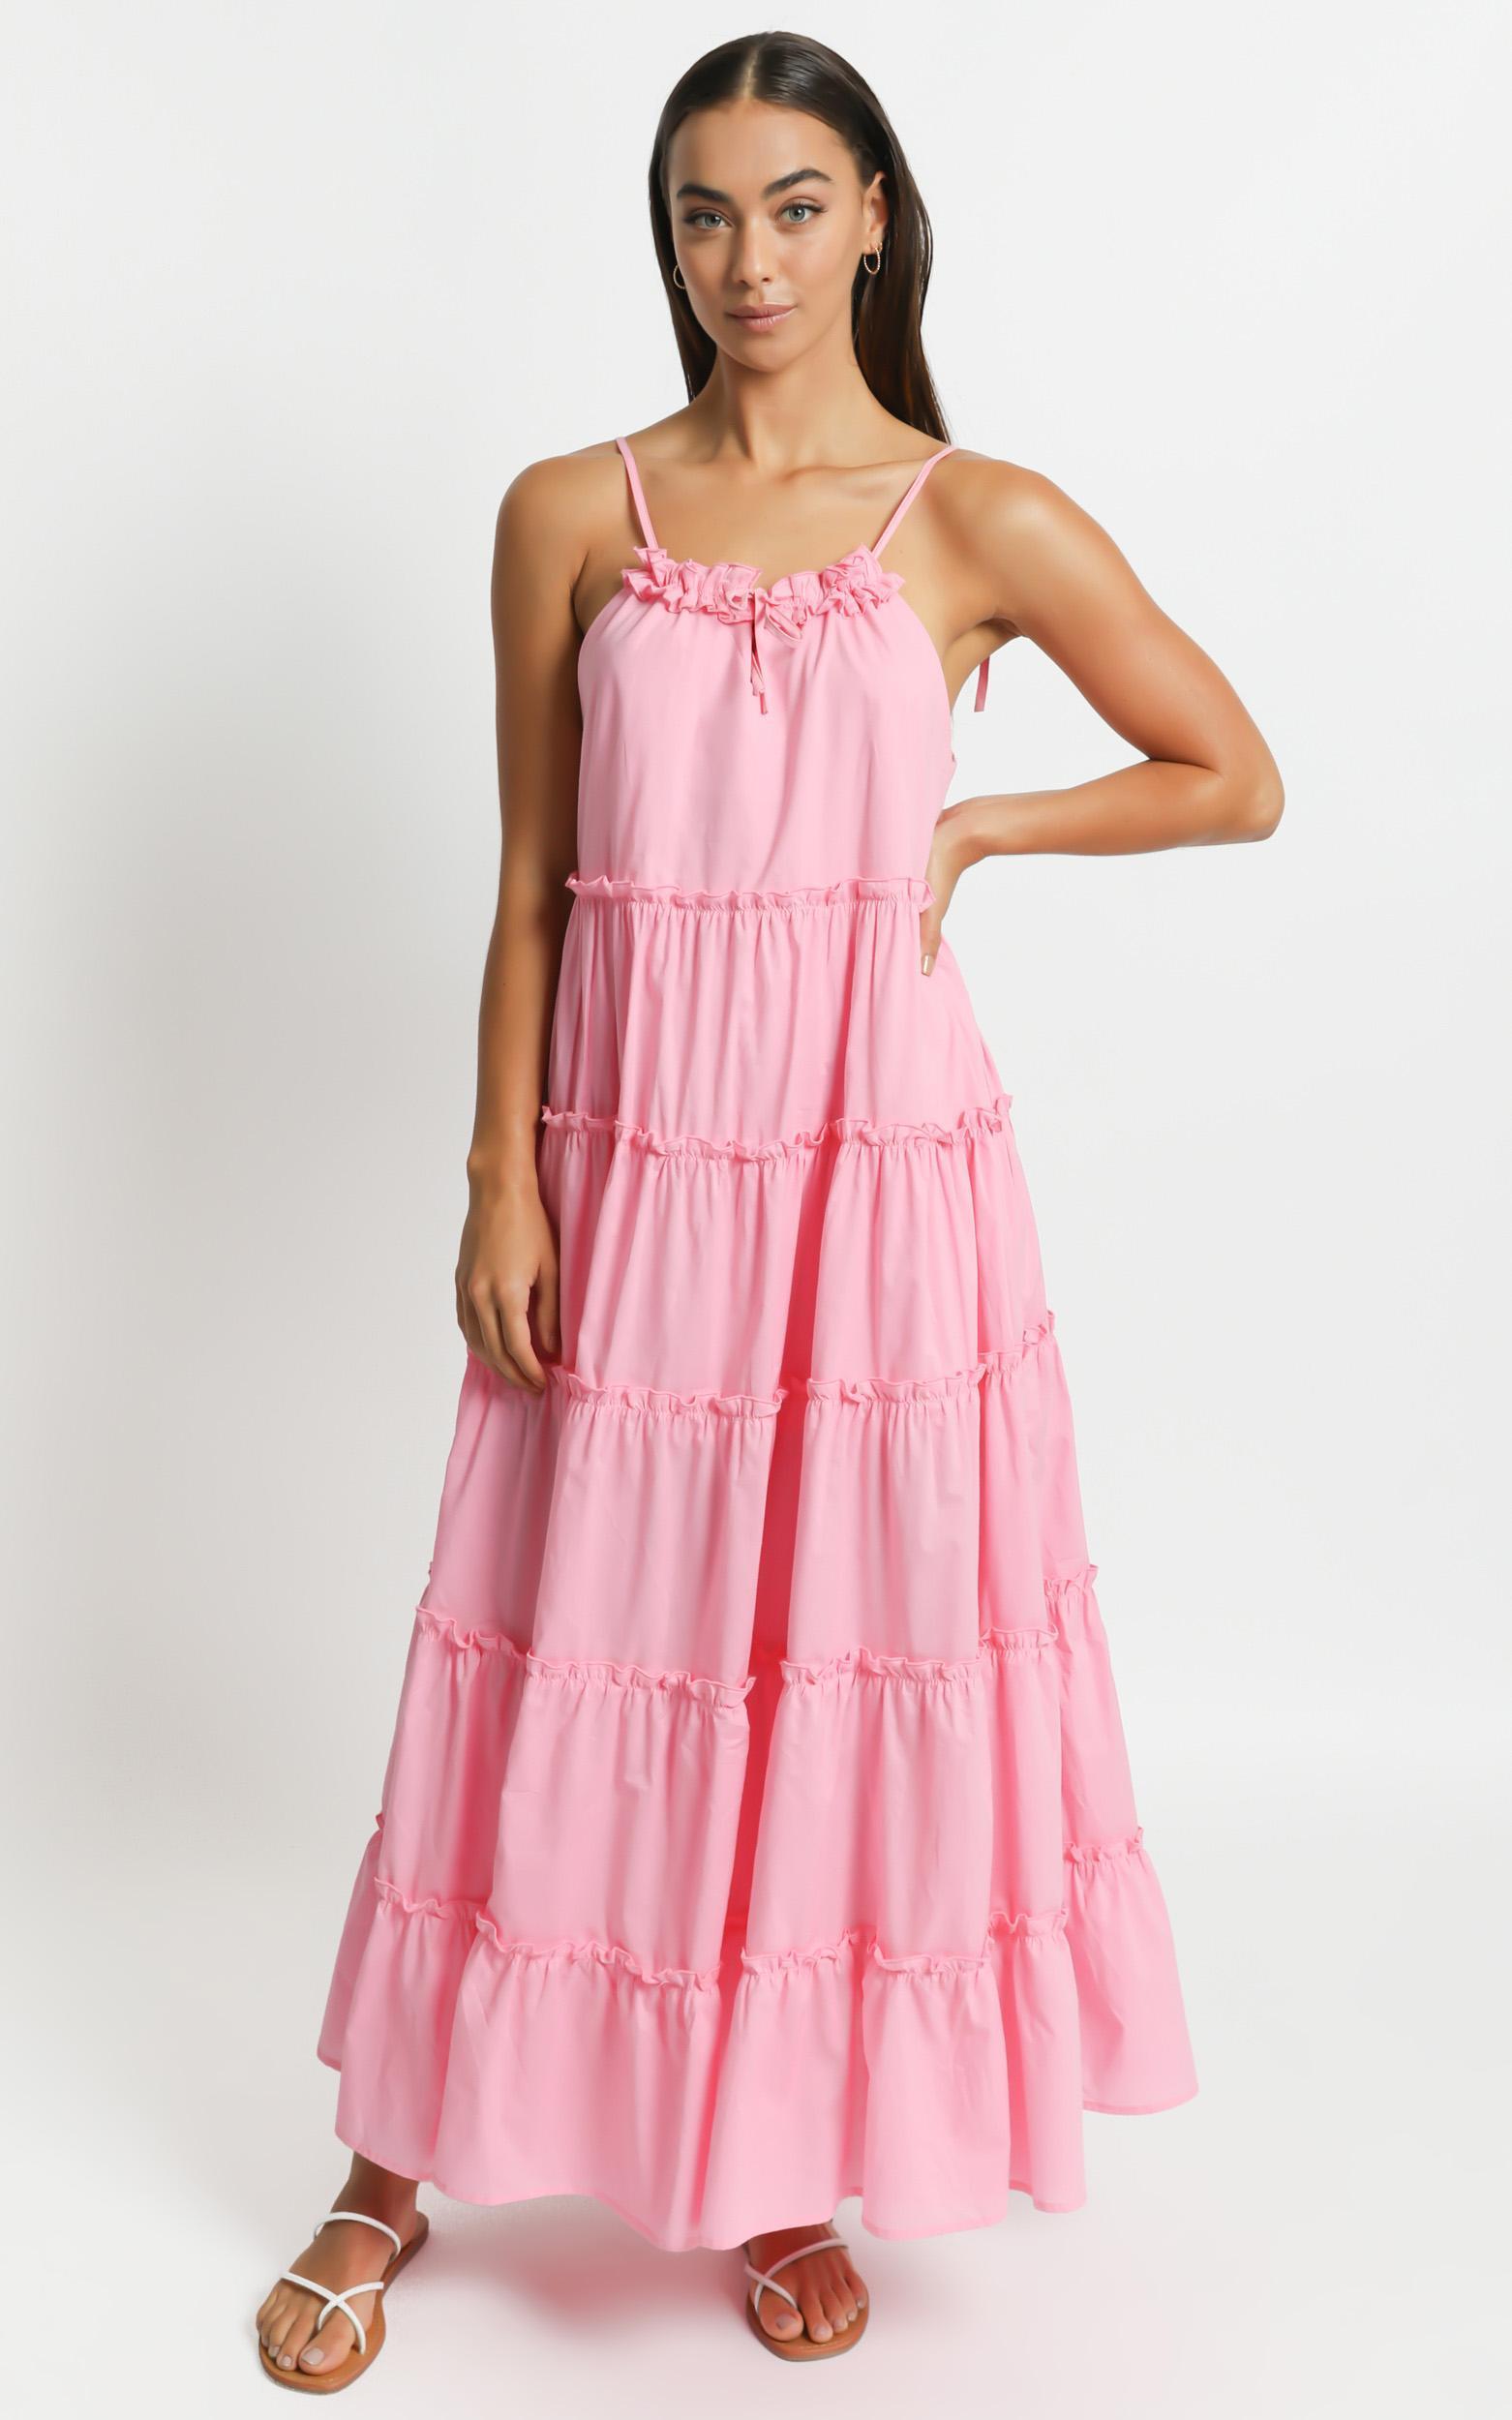 Charlie Holiday - Senorita Maxi Dress in Bubblegum - XS, Pink, hi-res image number null